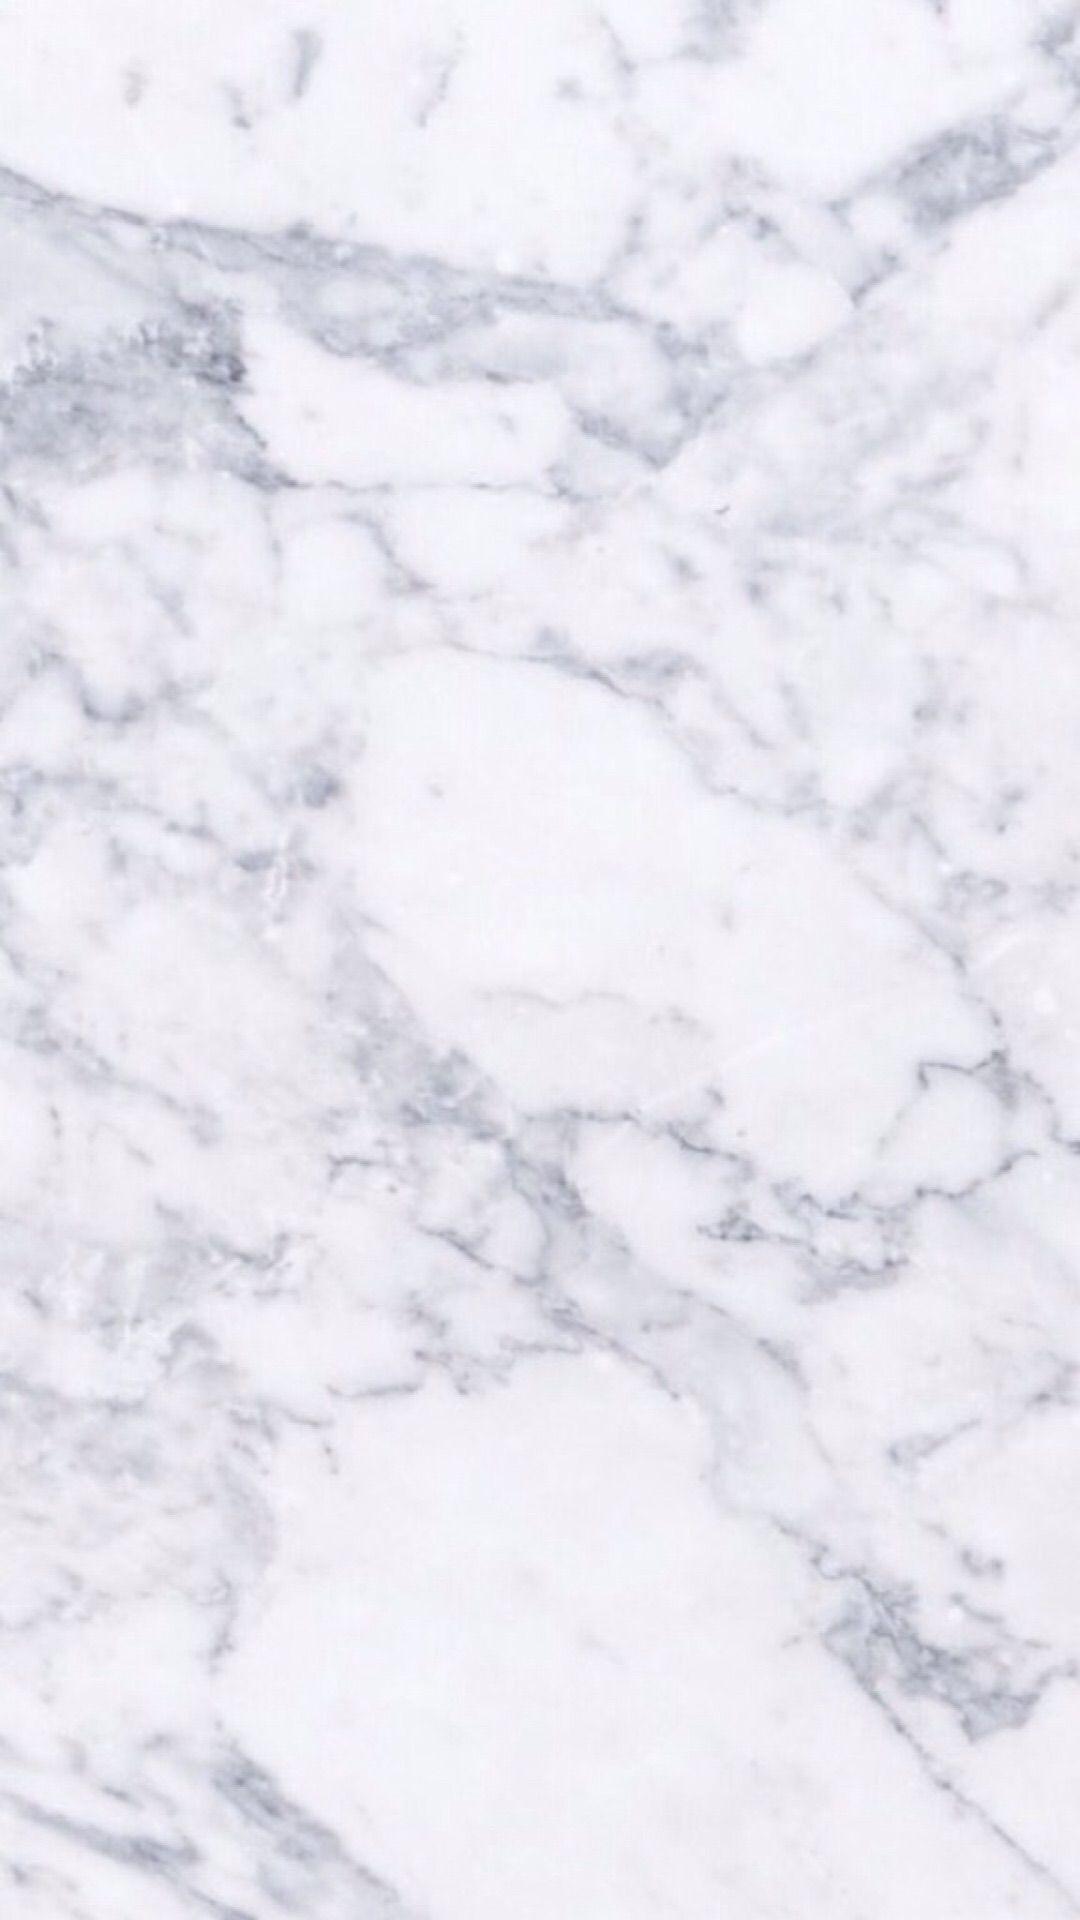 White Marble Aesthetic Wallpapers On Wallpaperdog